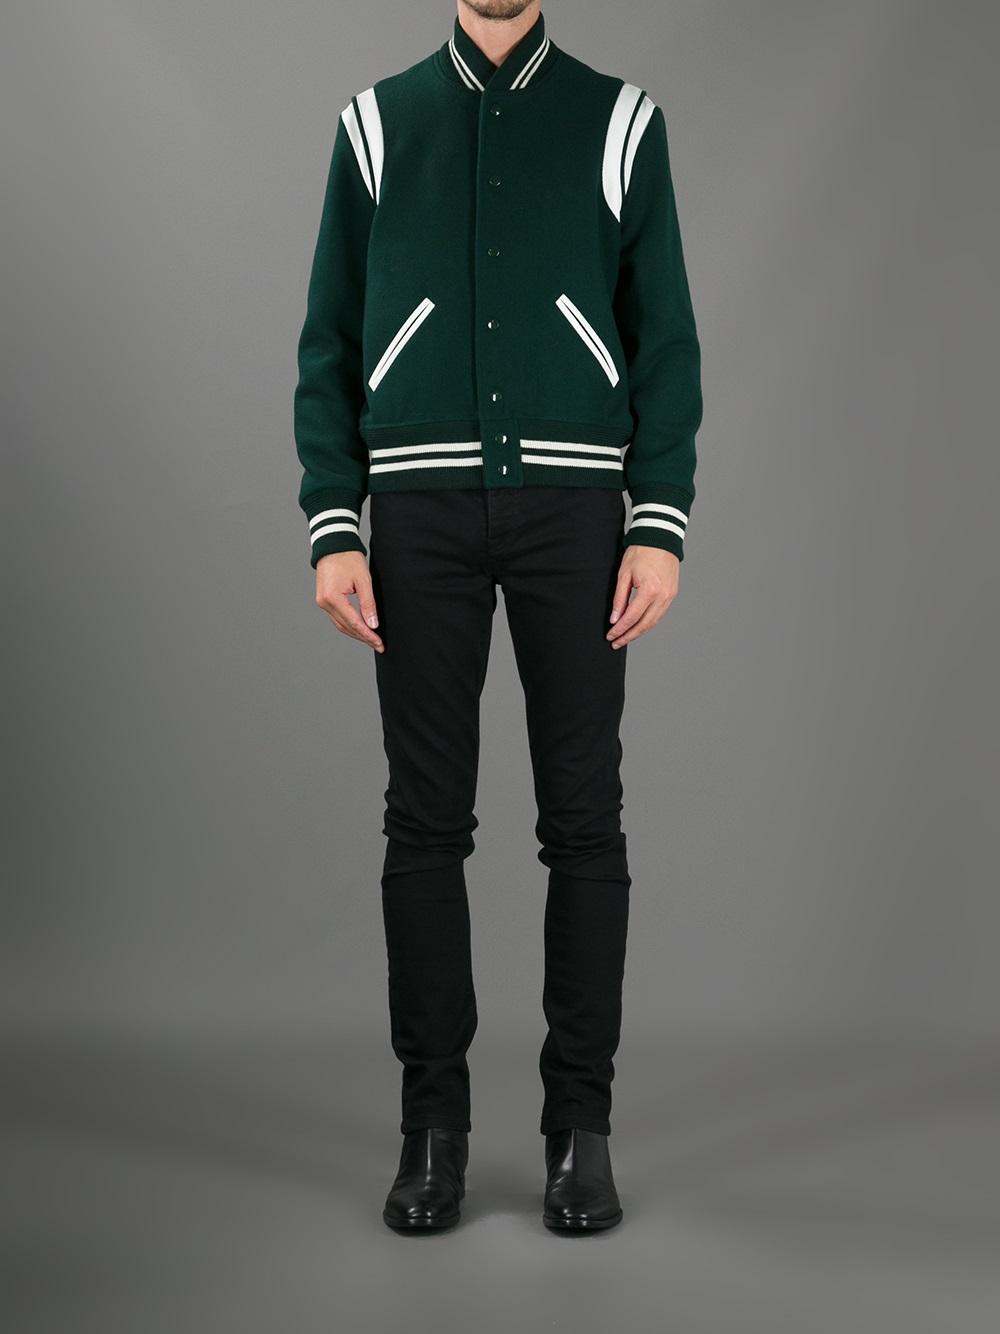 Find great deals on eBay for saint laurent jacket. Shop with confidence.